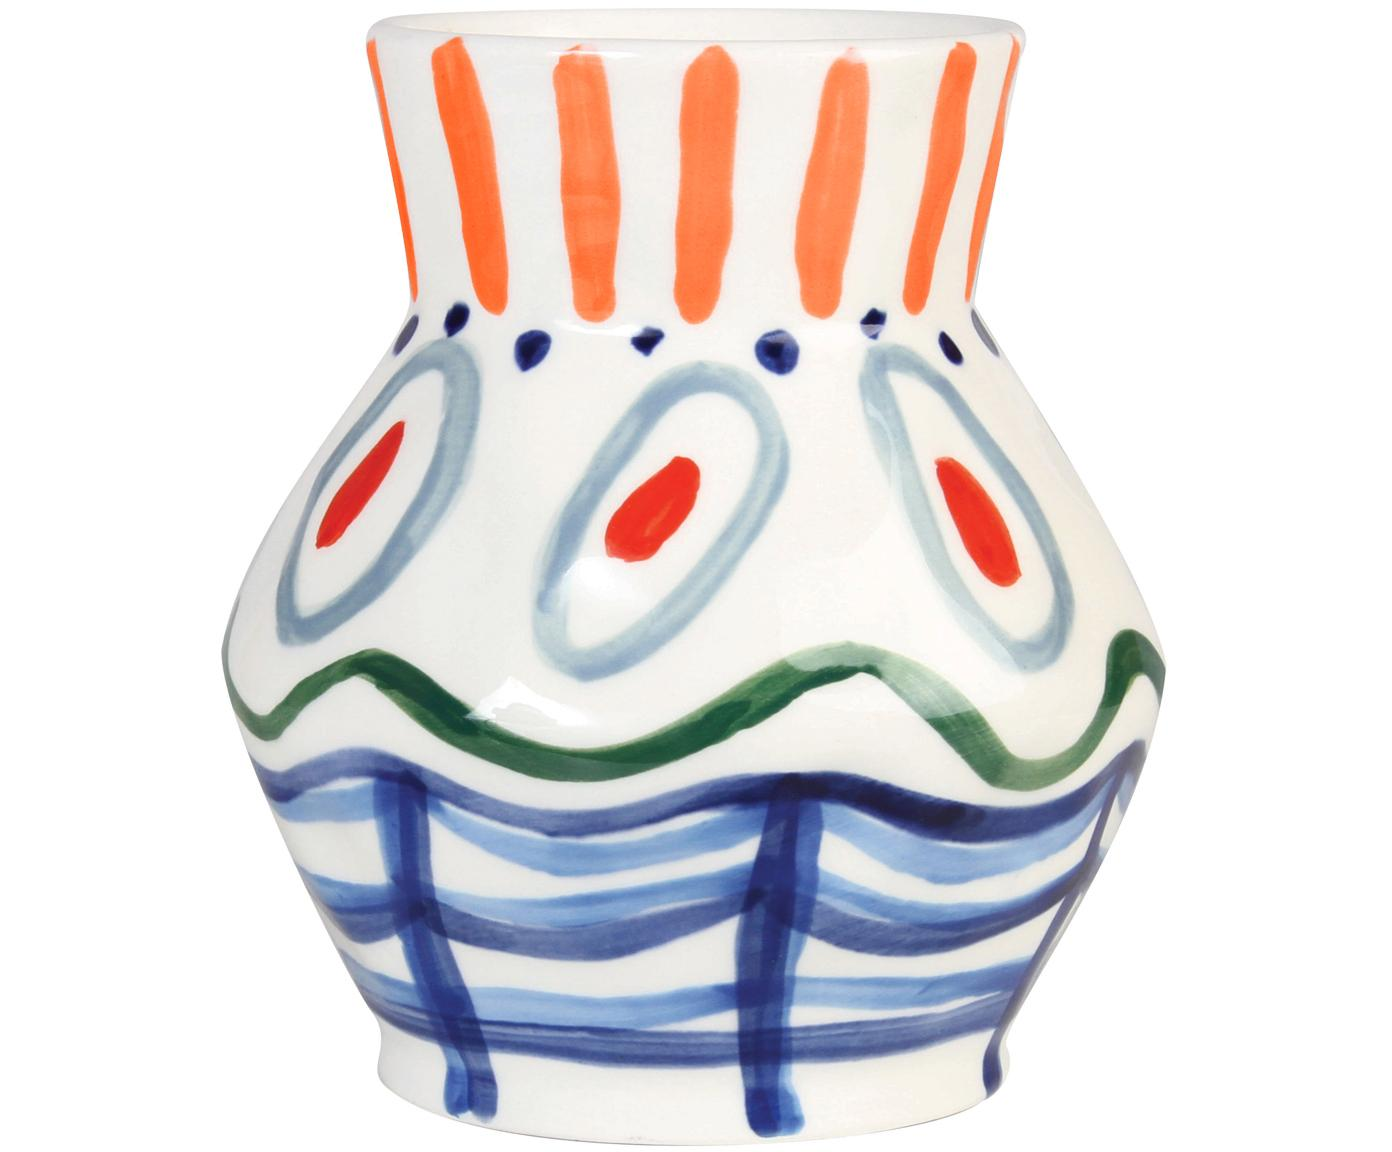 Vaso fatto a mano Dalil, Ceramica, Bianco, blu, verde, arancione, Ø 12 x Alt. 15 cm